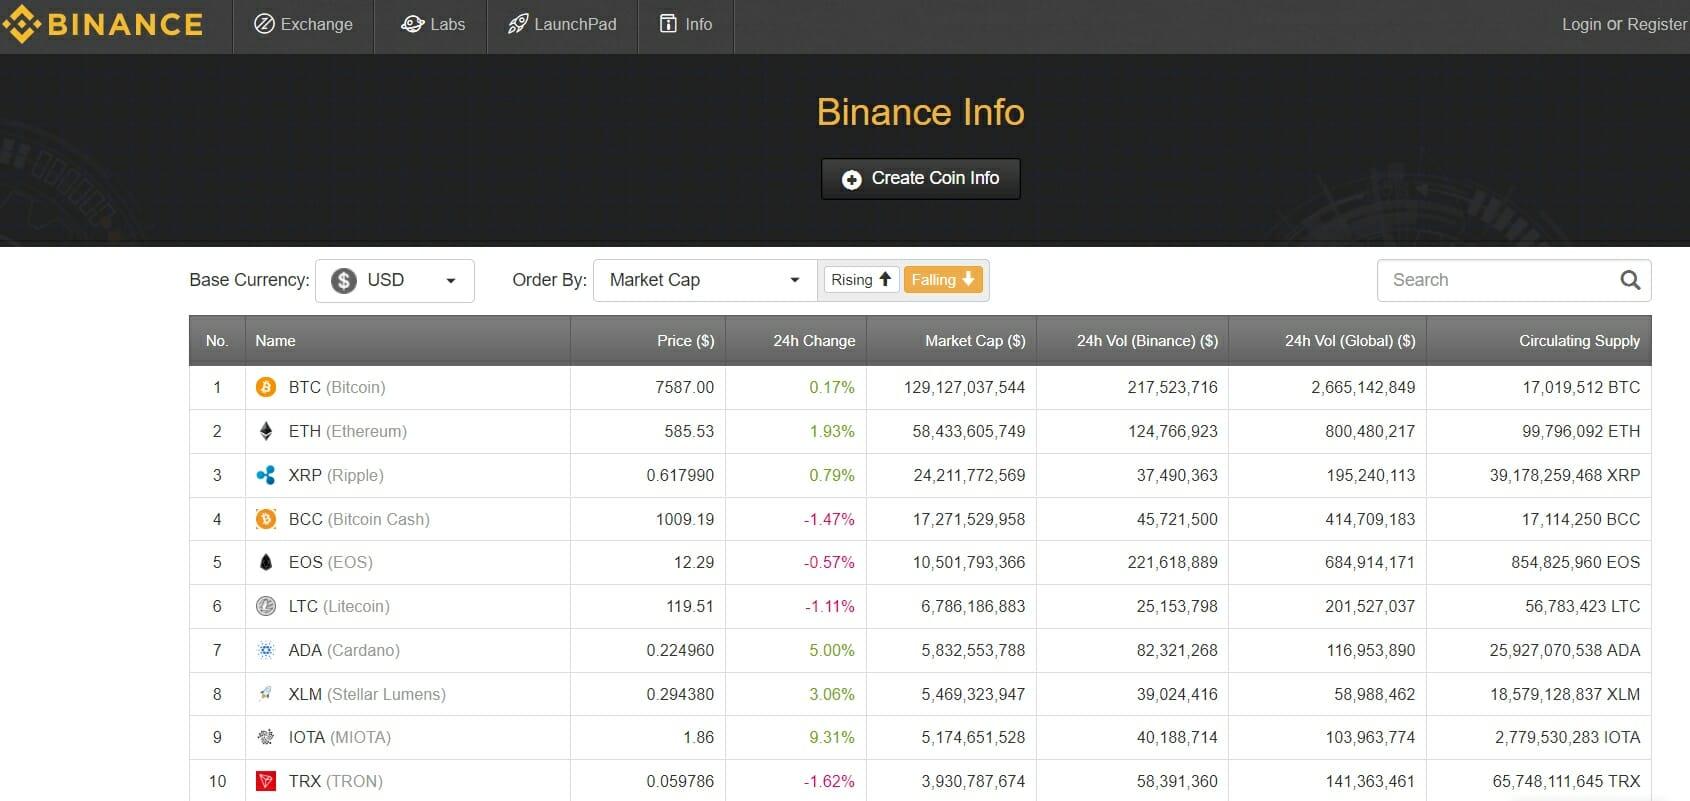 Binance exchange cryptocurrencies